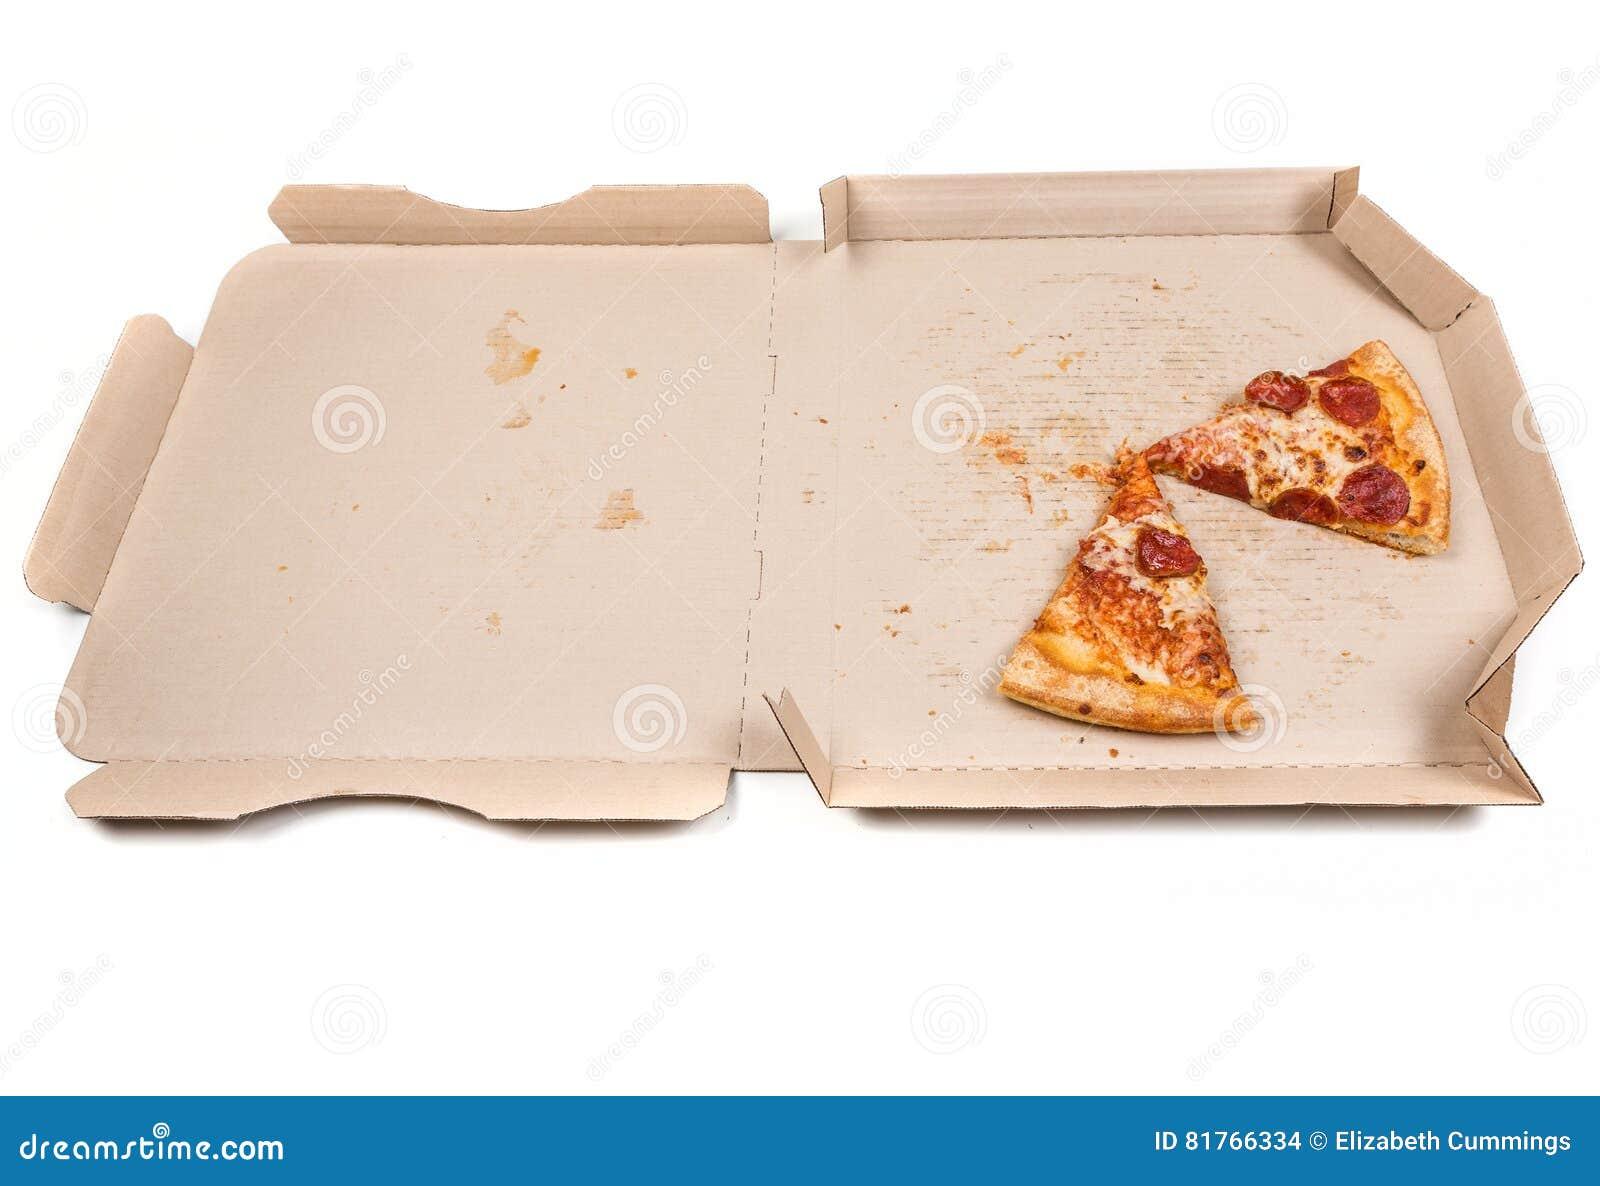 Остаток пицца в коробке